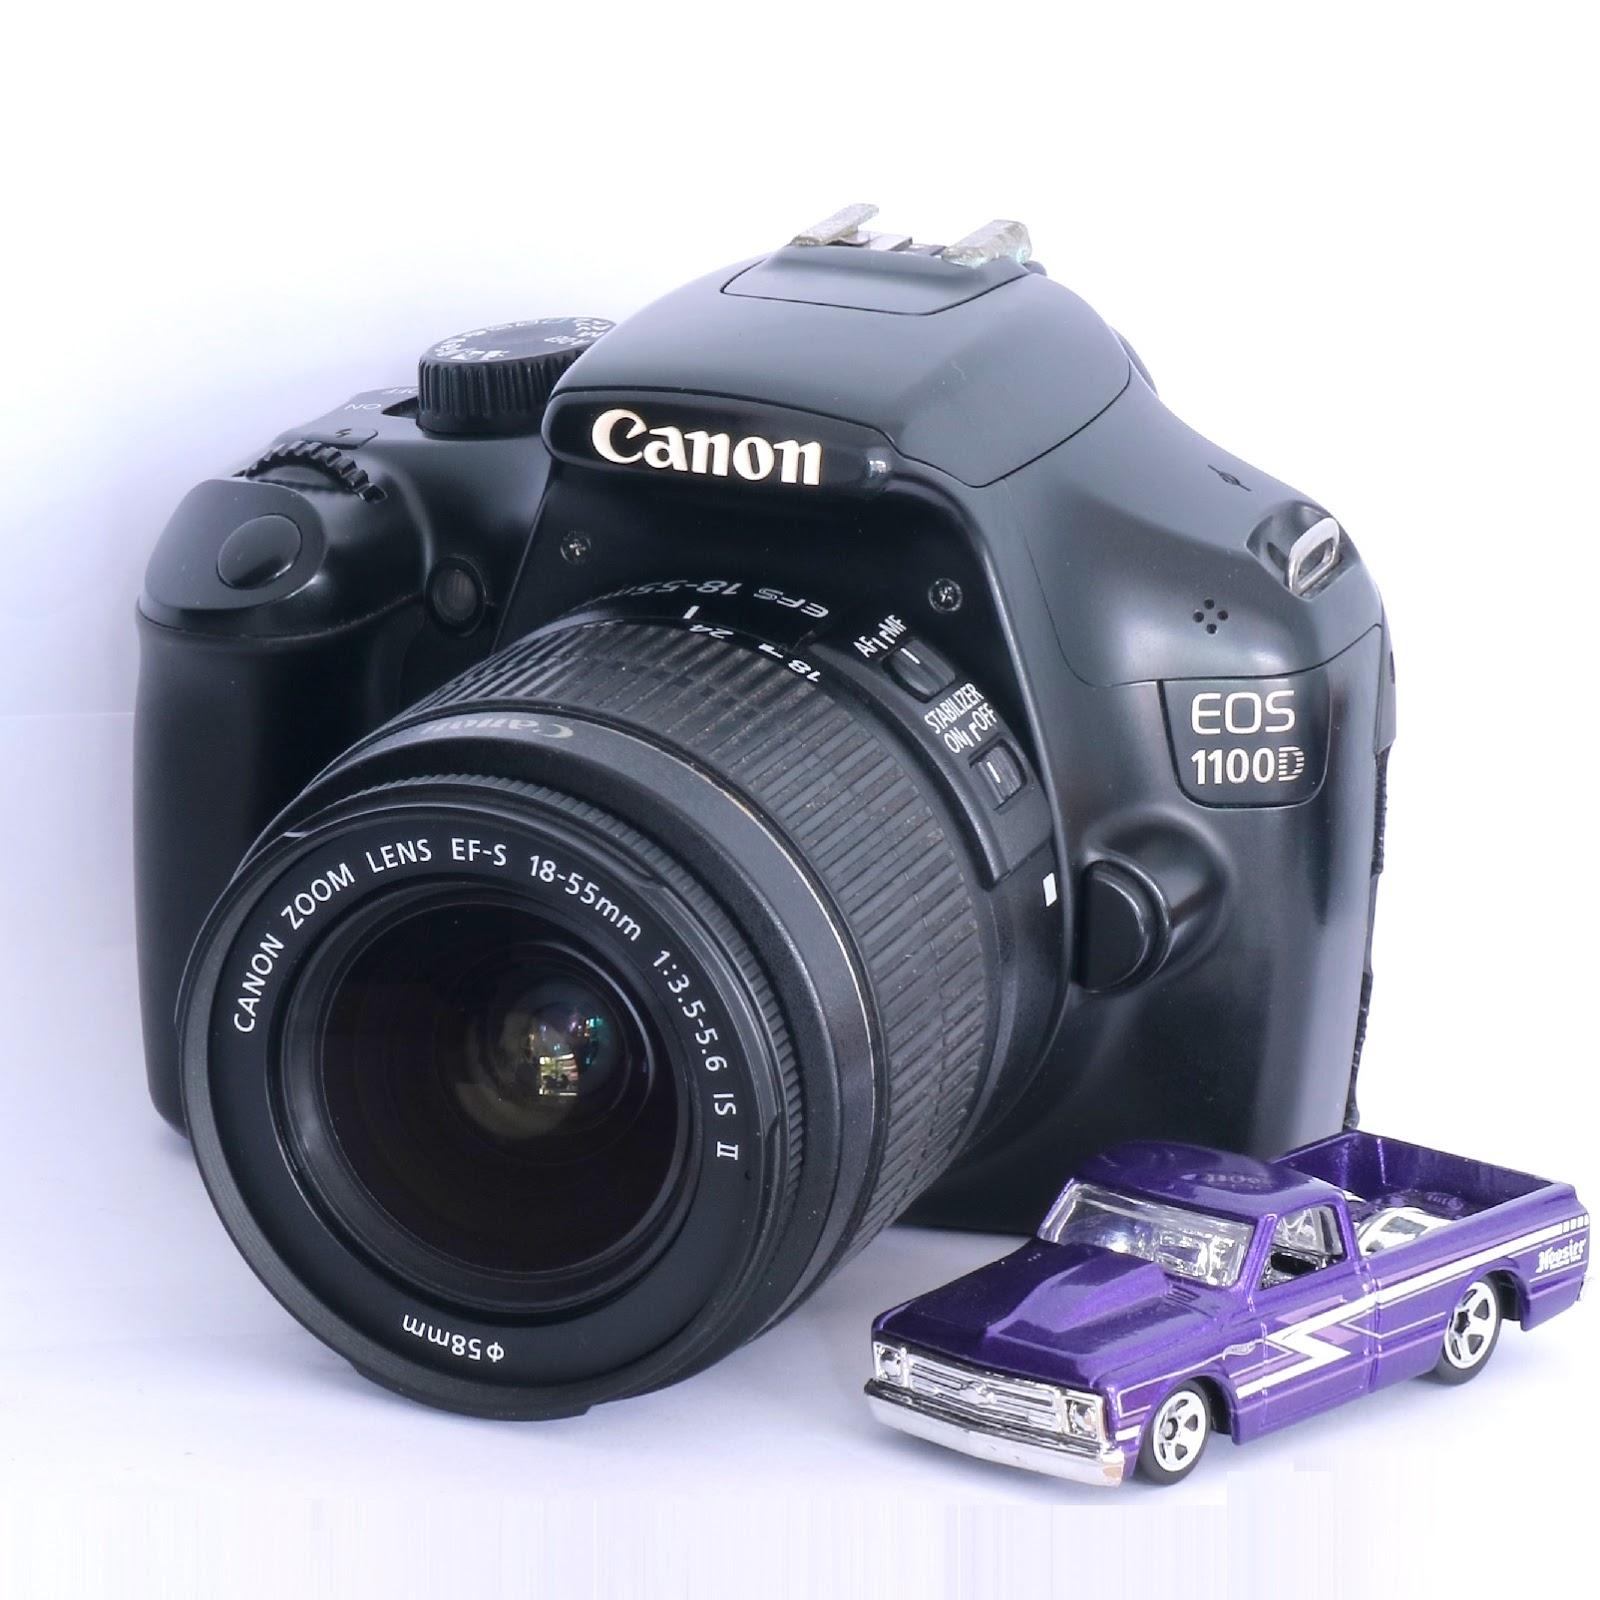 Jual Kamera Canon Eos 1100d Lensa Kit Fullset Jual Beli Laptop